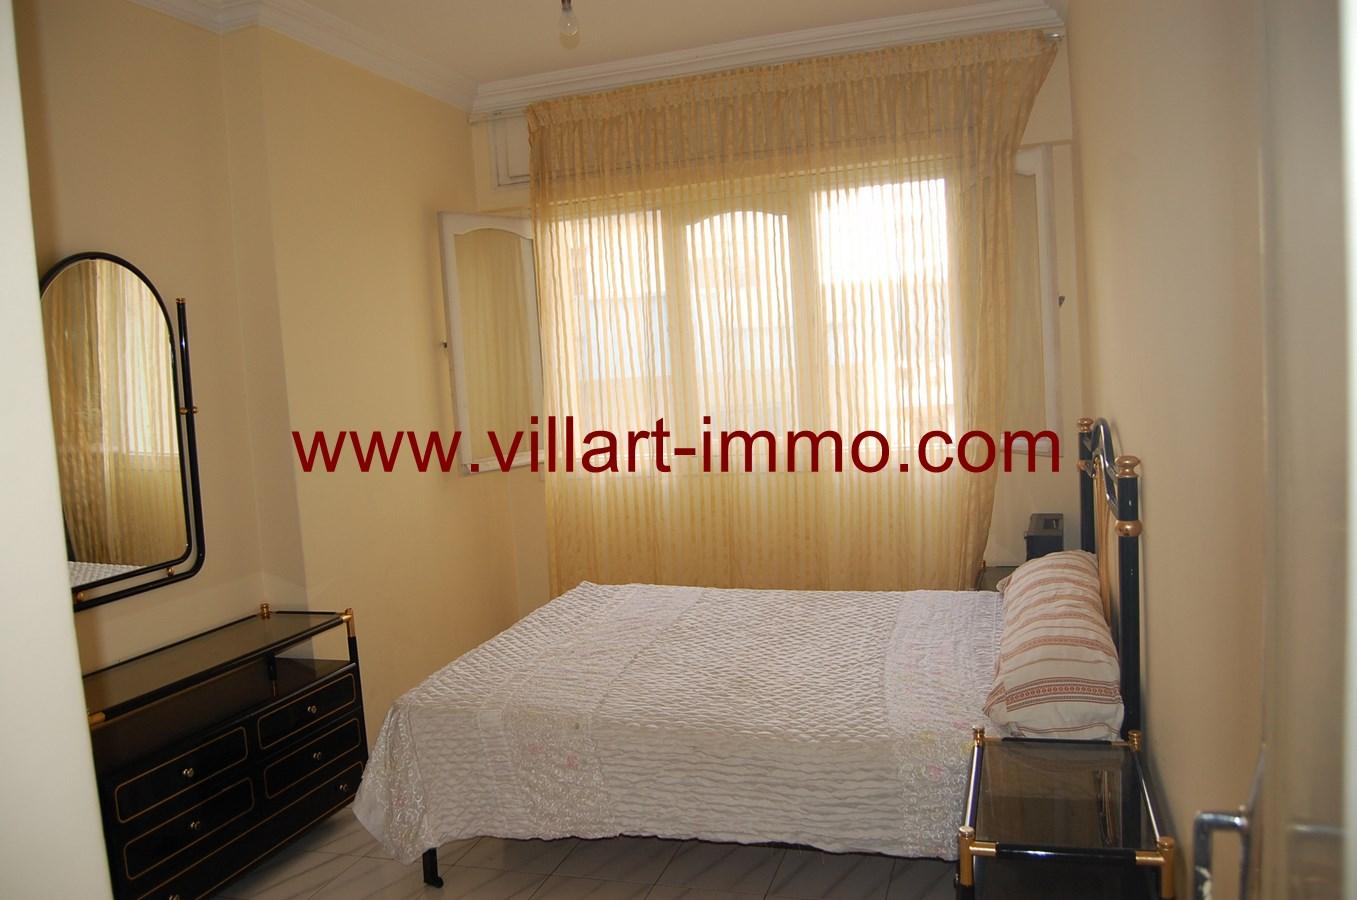 3-vente-appartement-tanger-centre-ville-chambre-1-va457-villart-immo